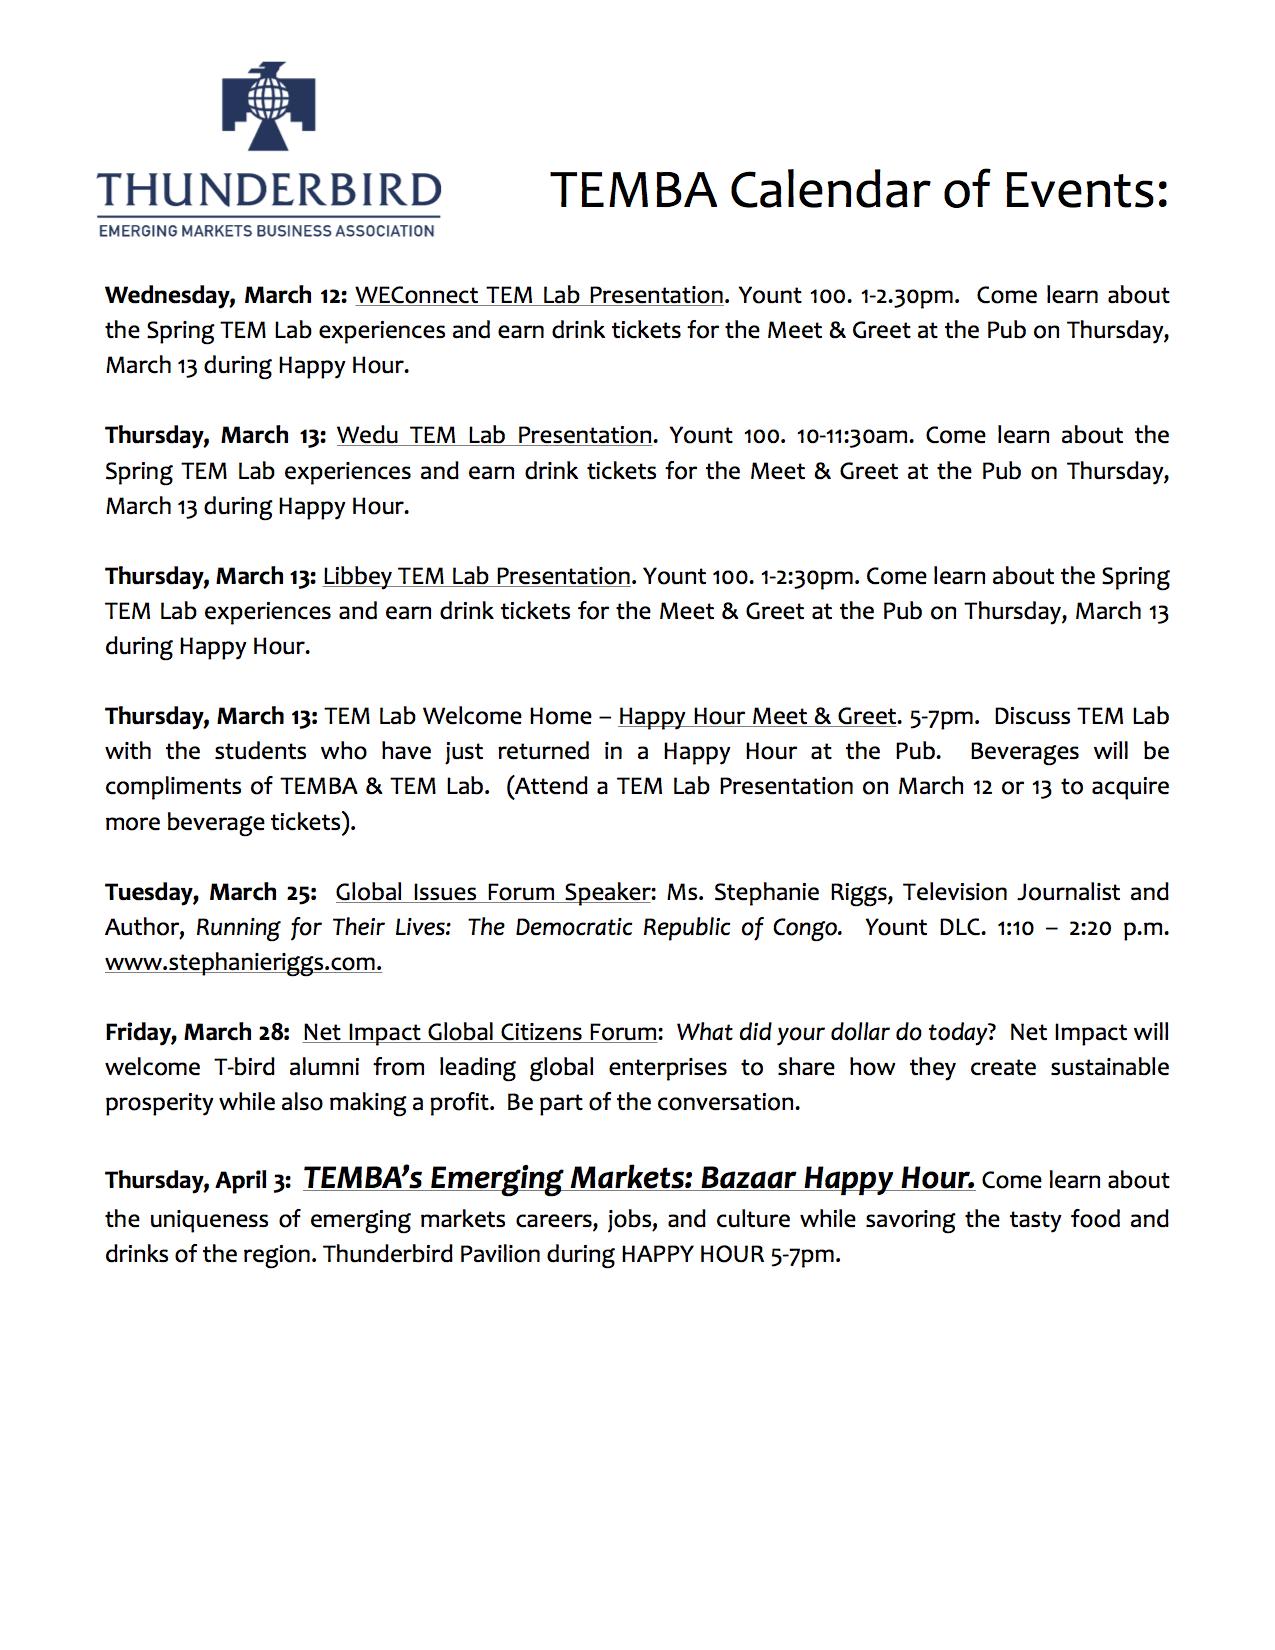 #TbirdLife #TEMBA Calendar of Events for Spring 2014